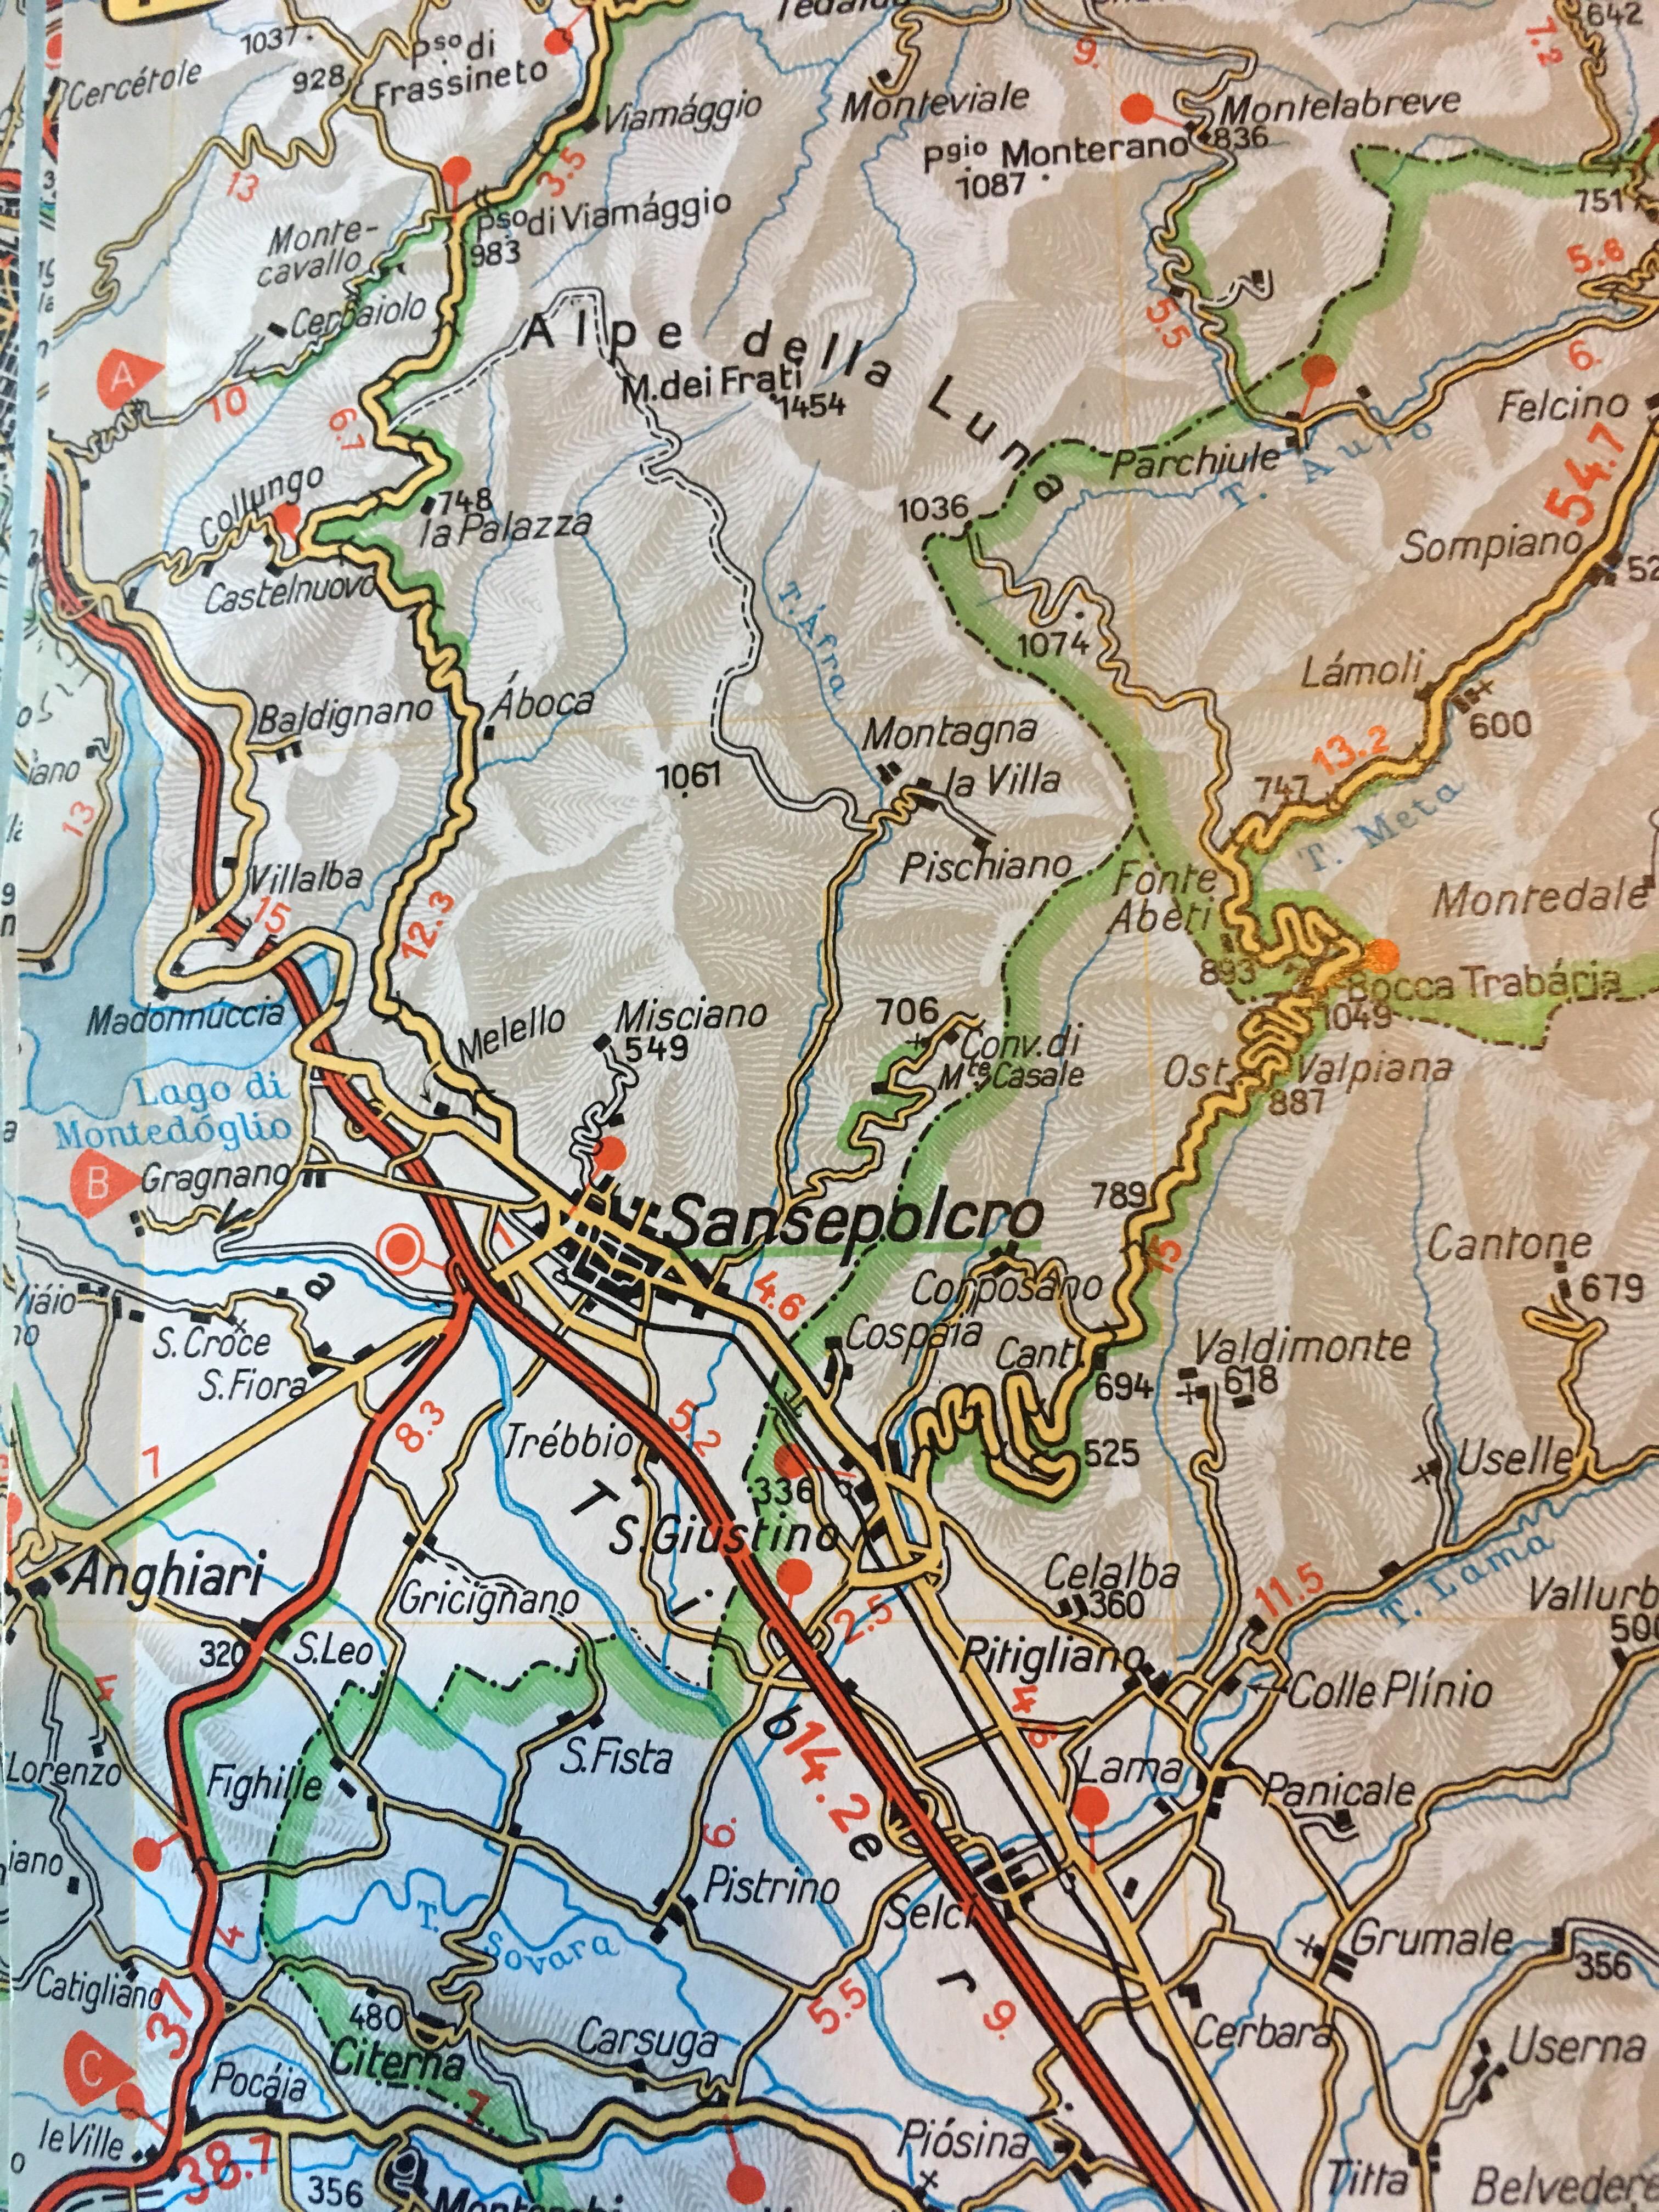 Anghiari Italy Map.Day34 Anghiari To Lamoli Travels With Marilyn Page 2